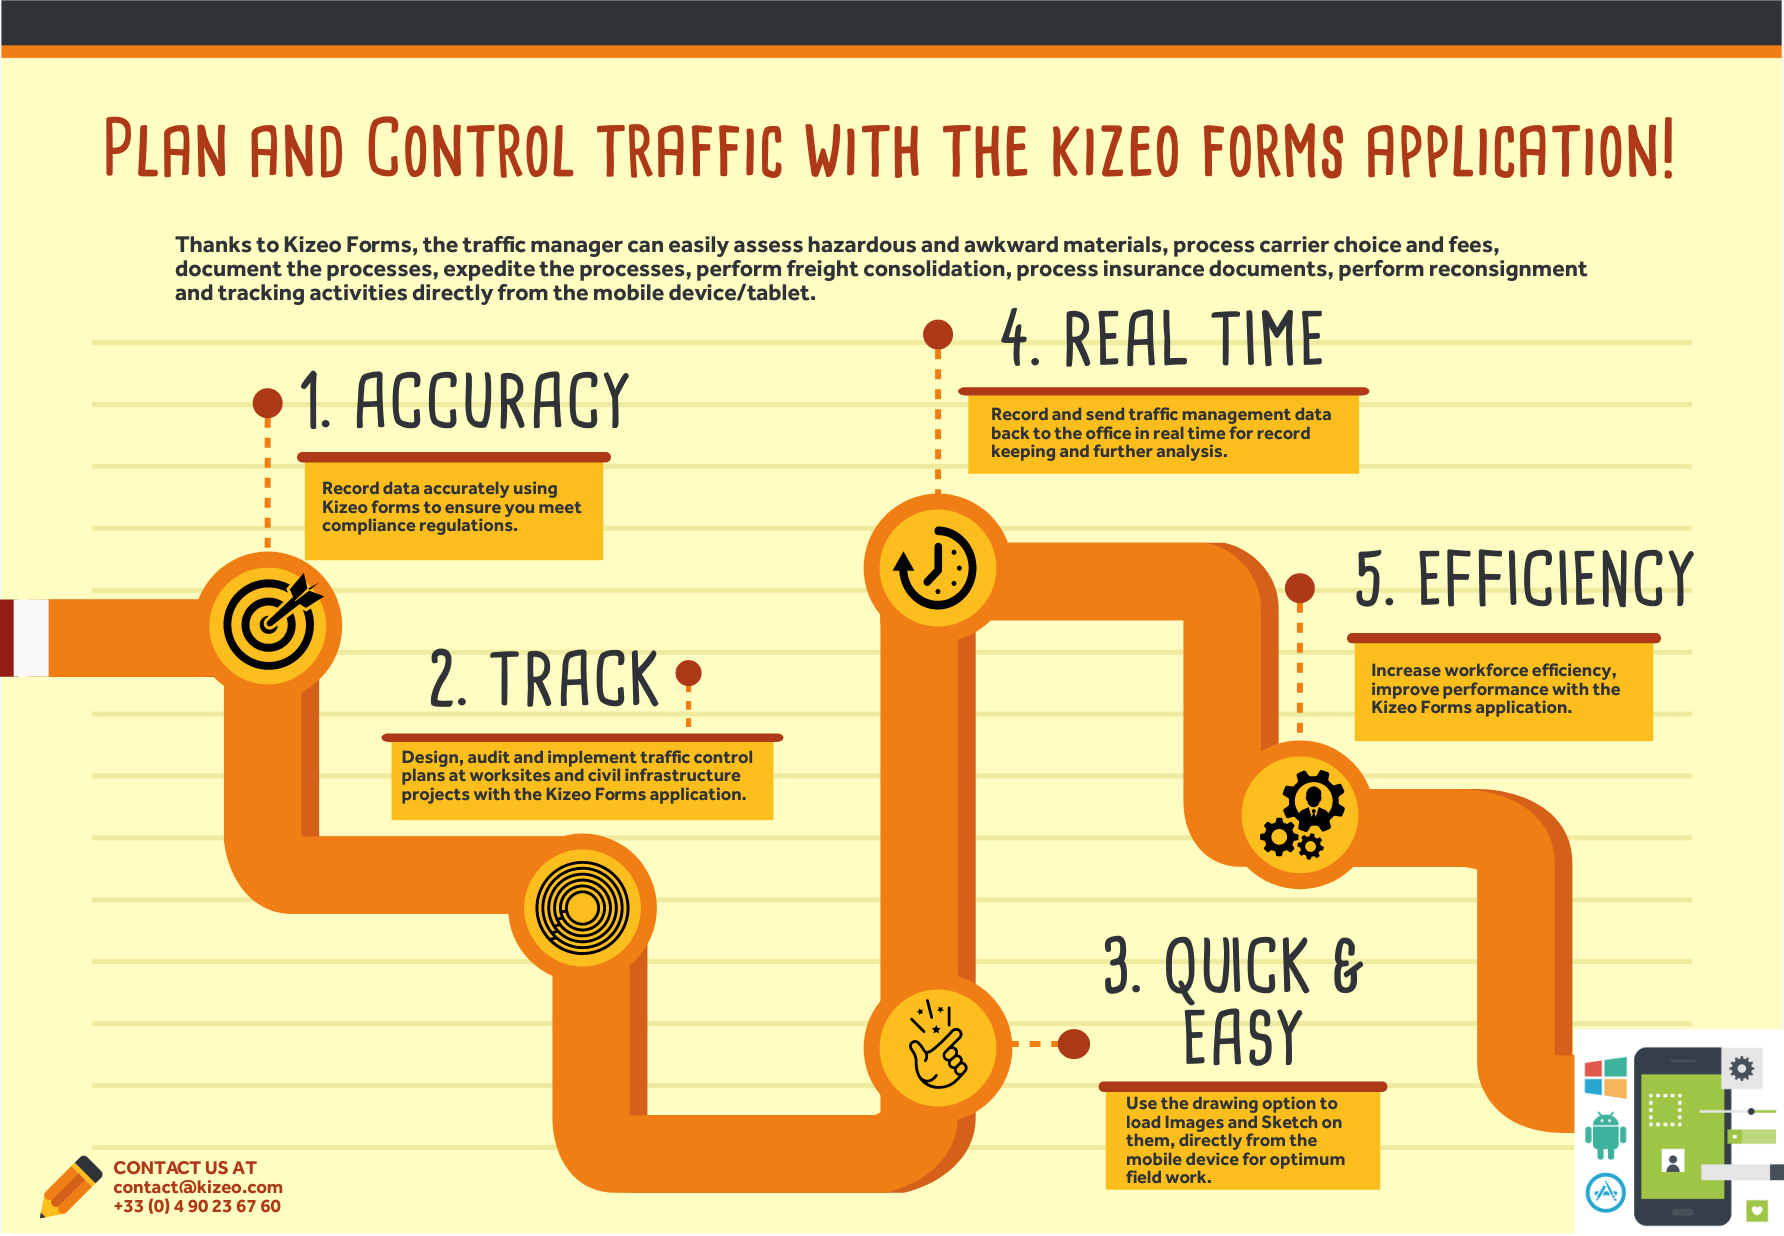 Digital Forms for traffic management